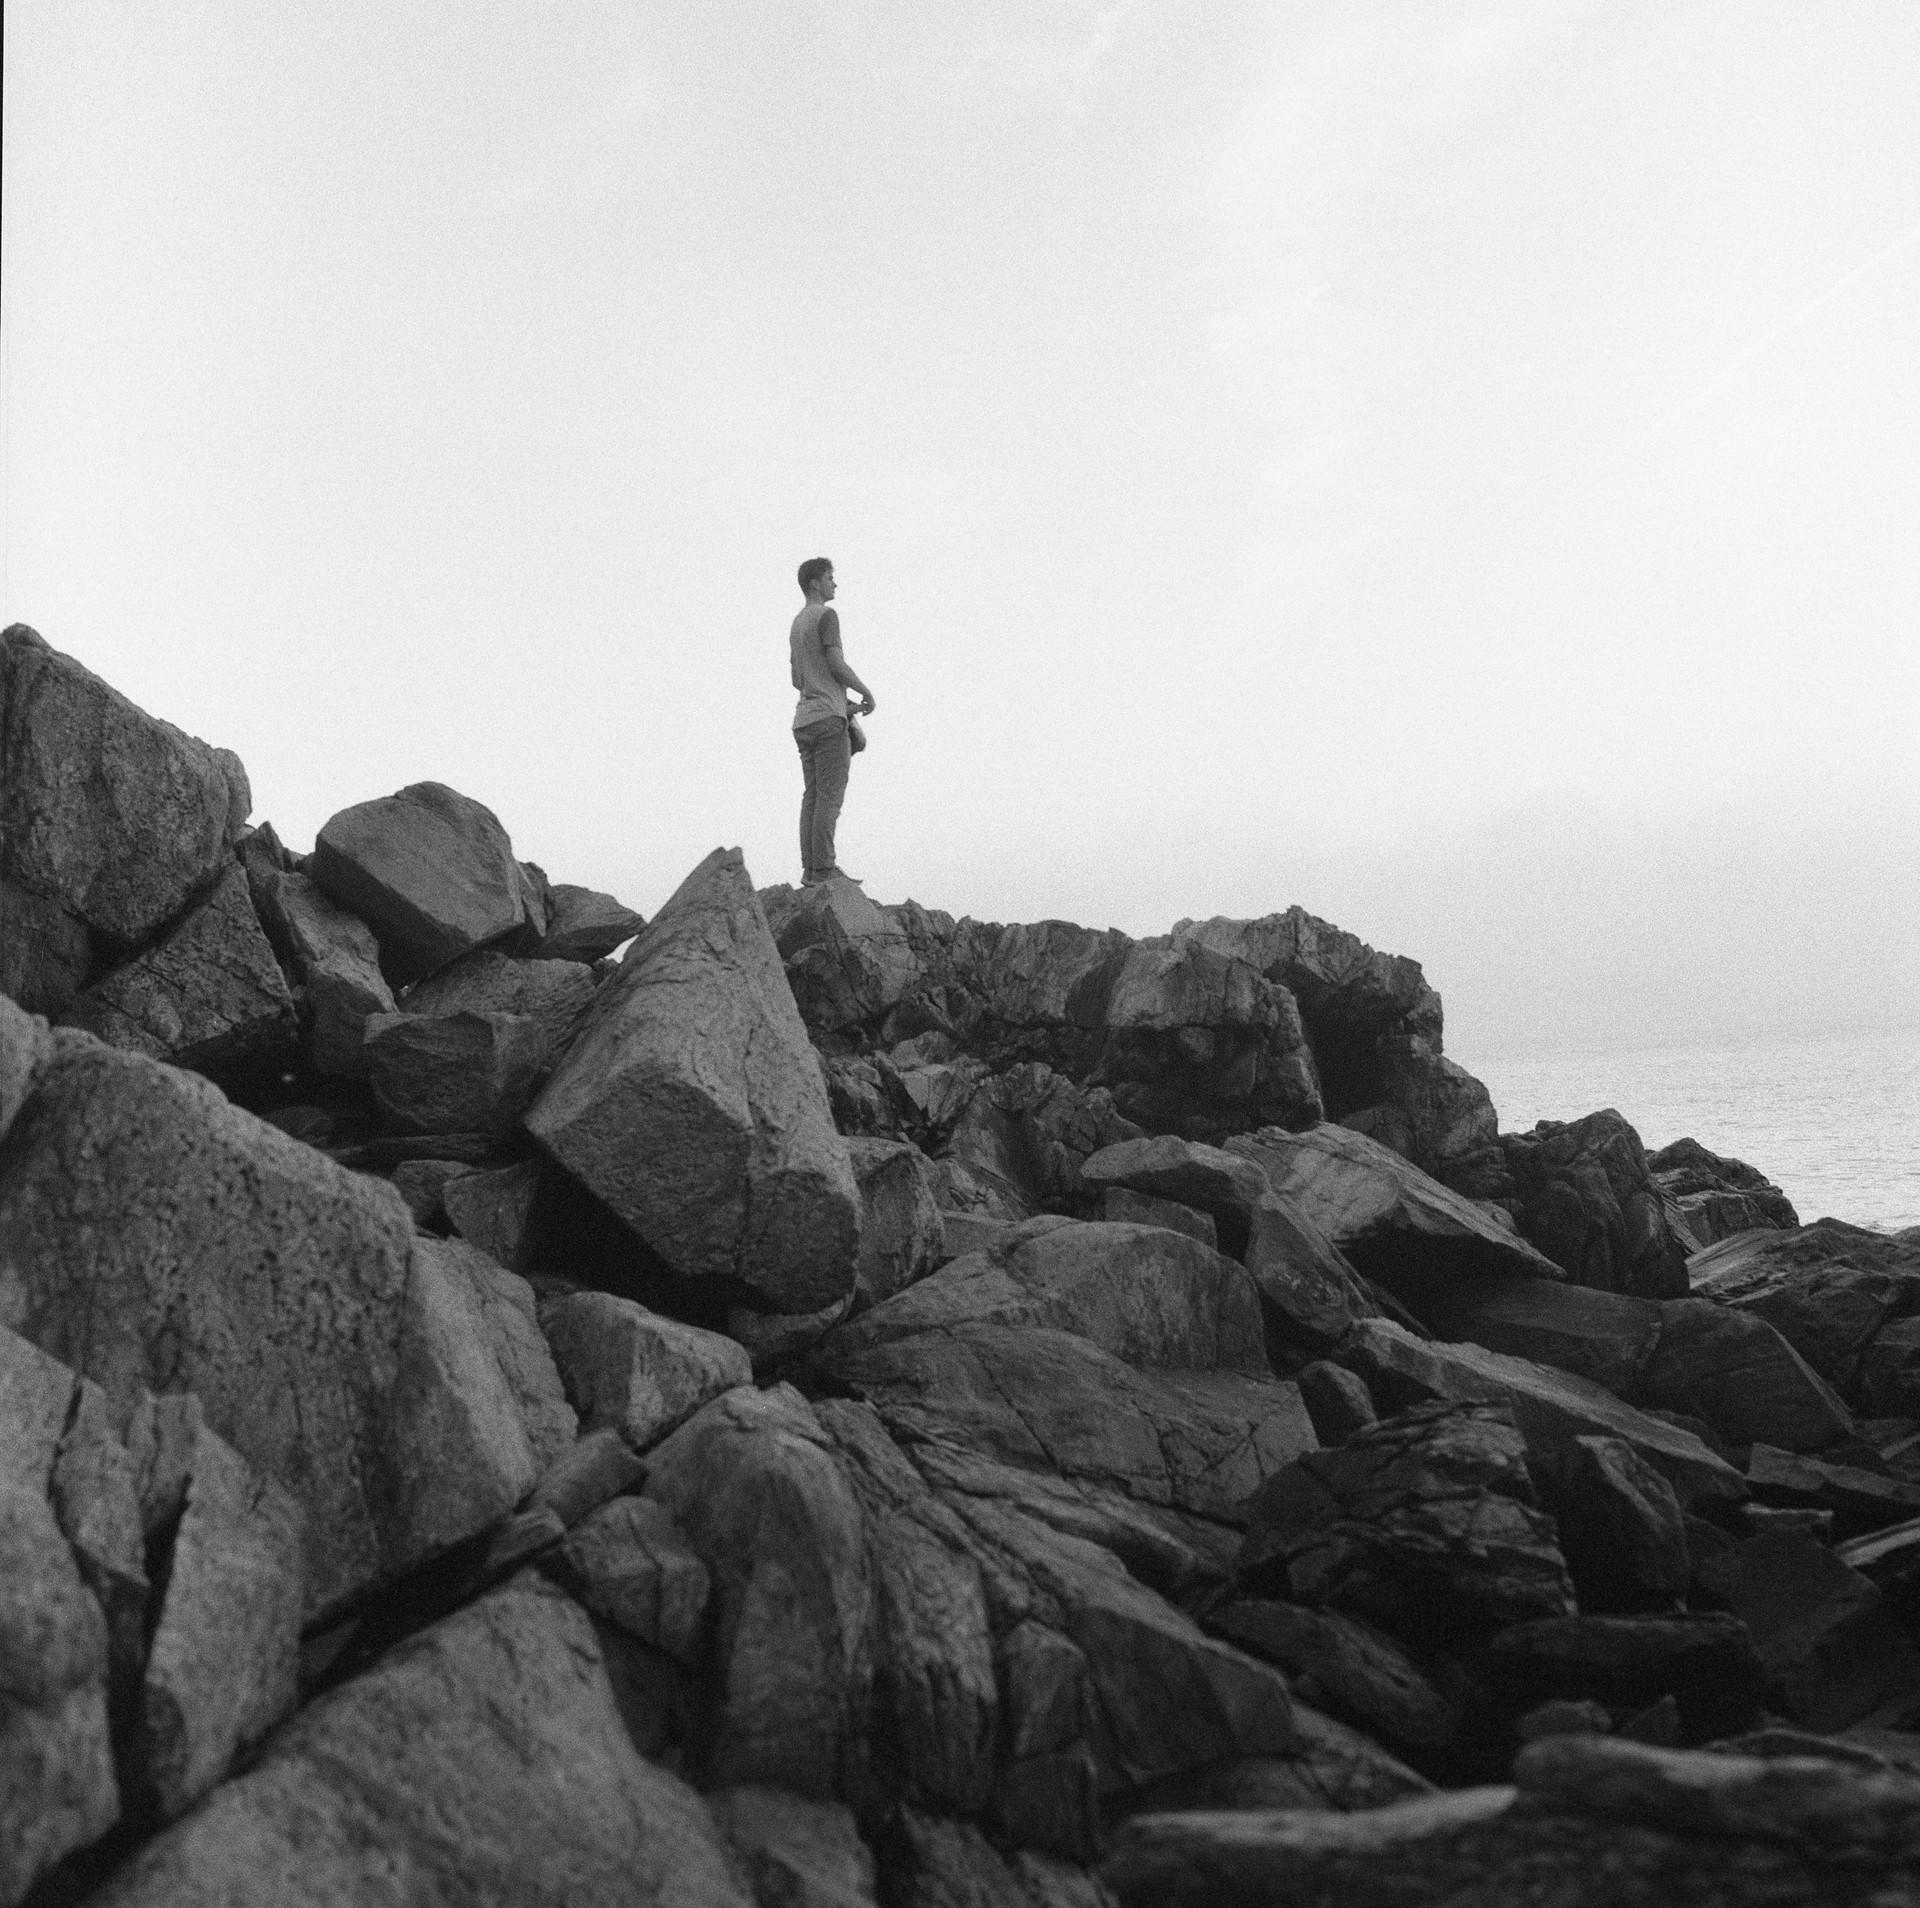 cody on rocks